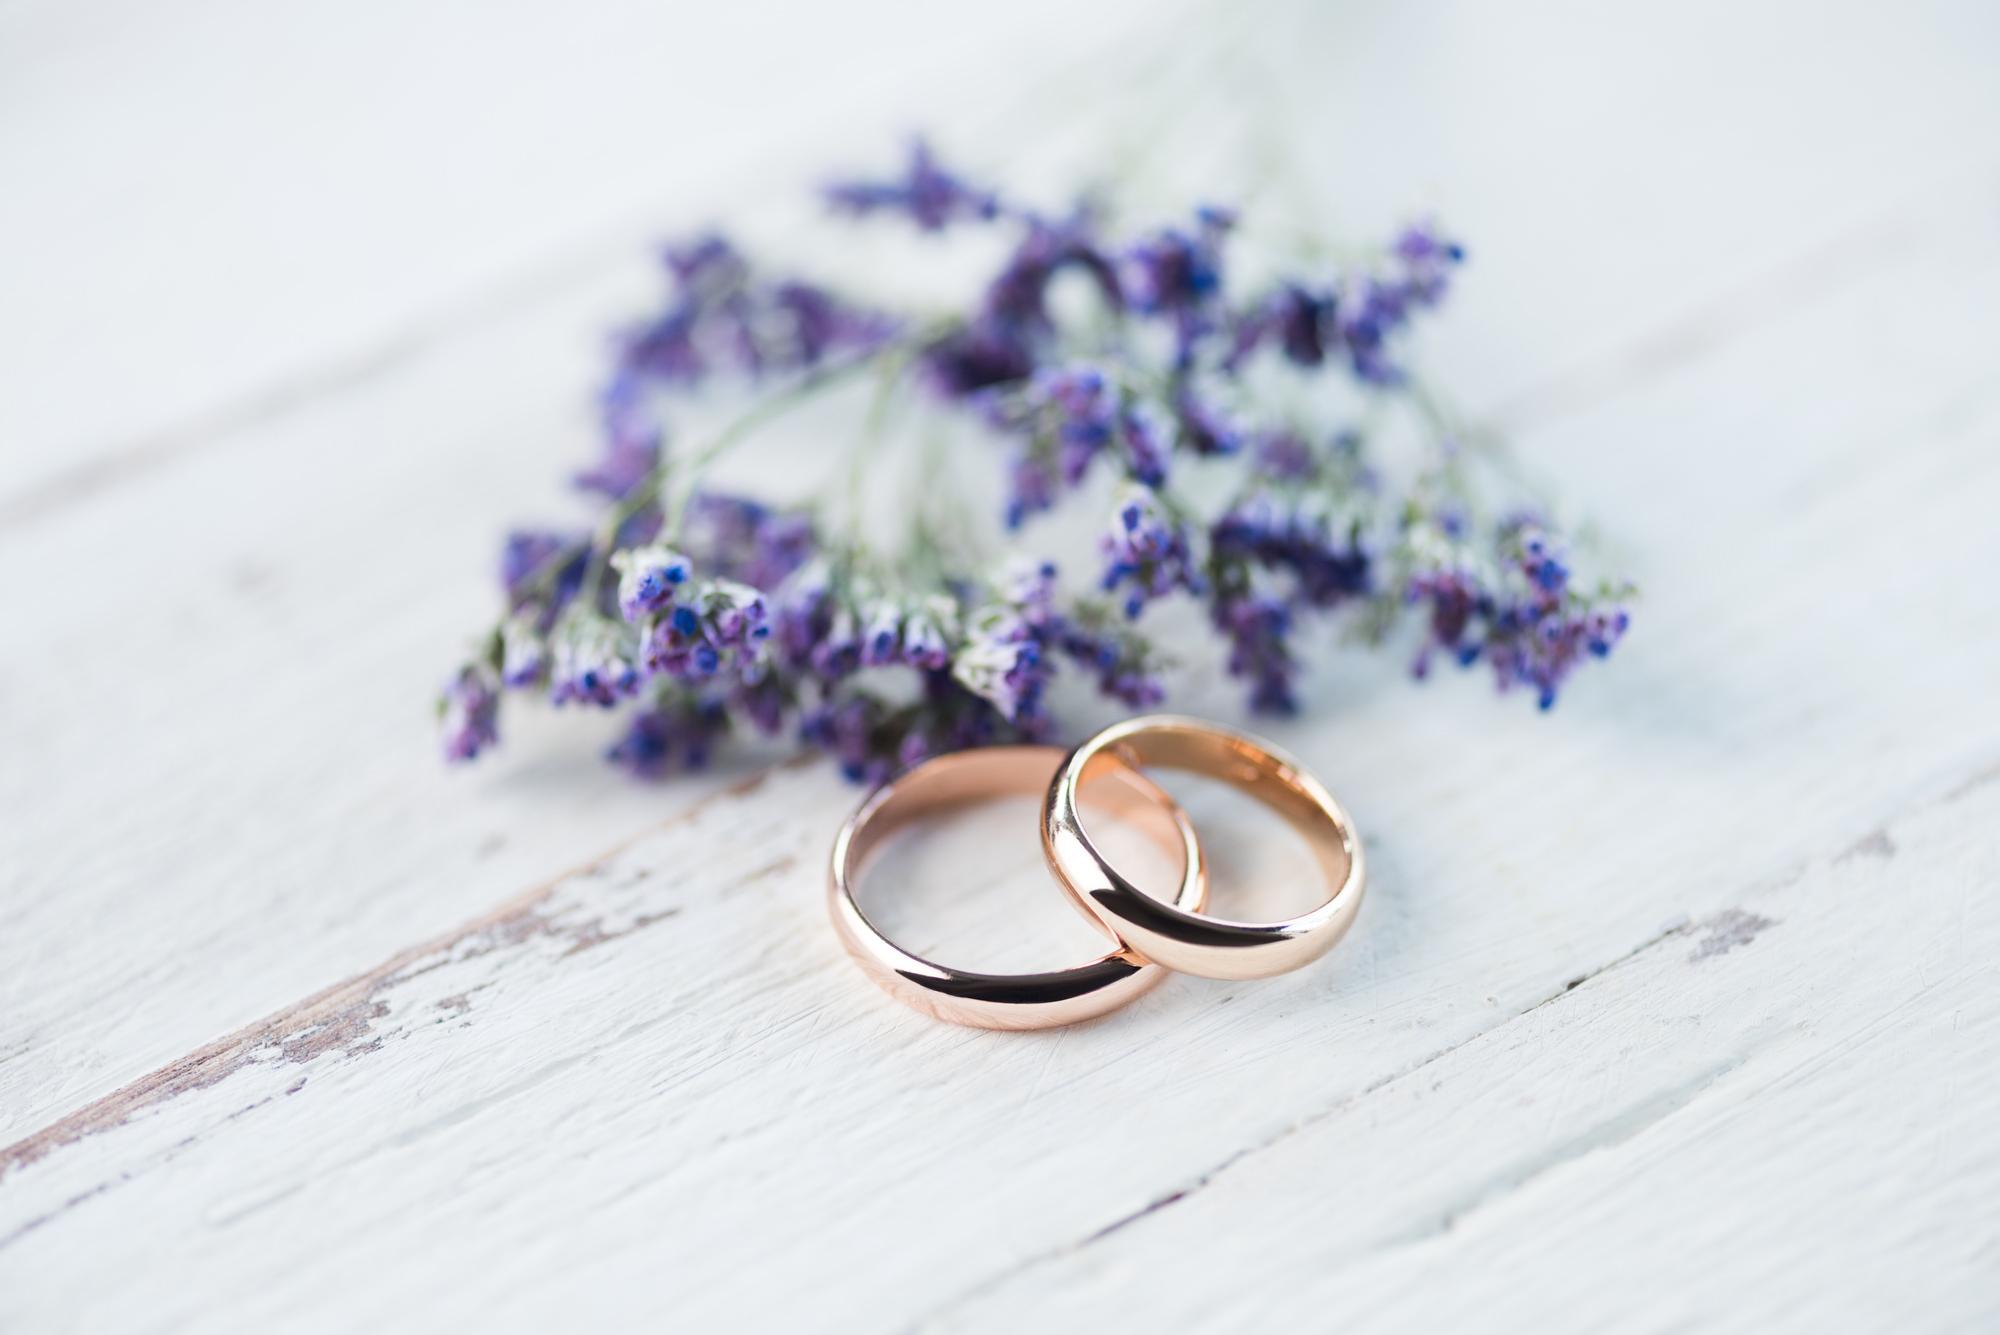 10 Best Wedding Venues in Pensacola, Florida